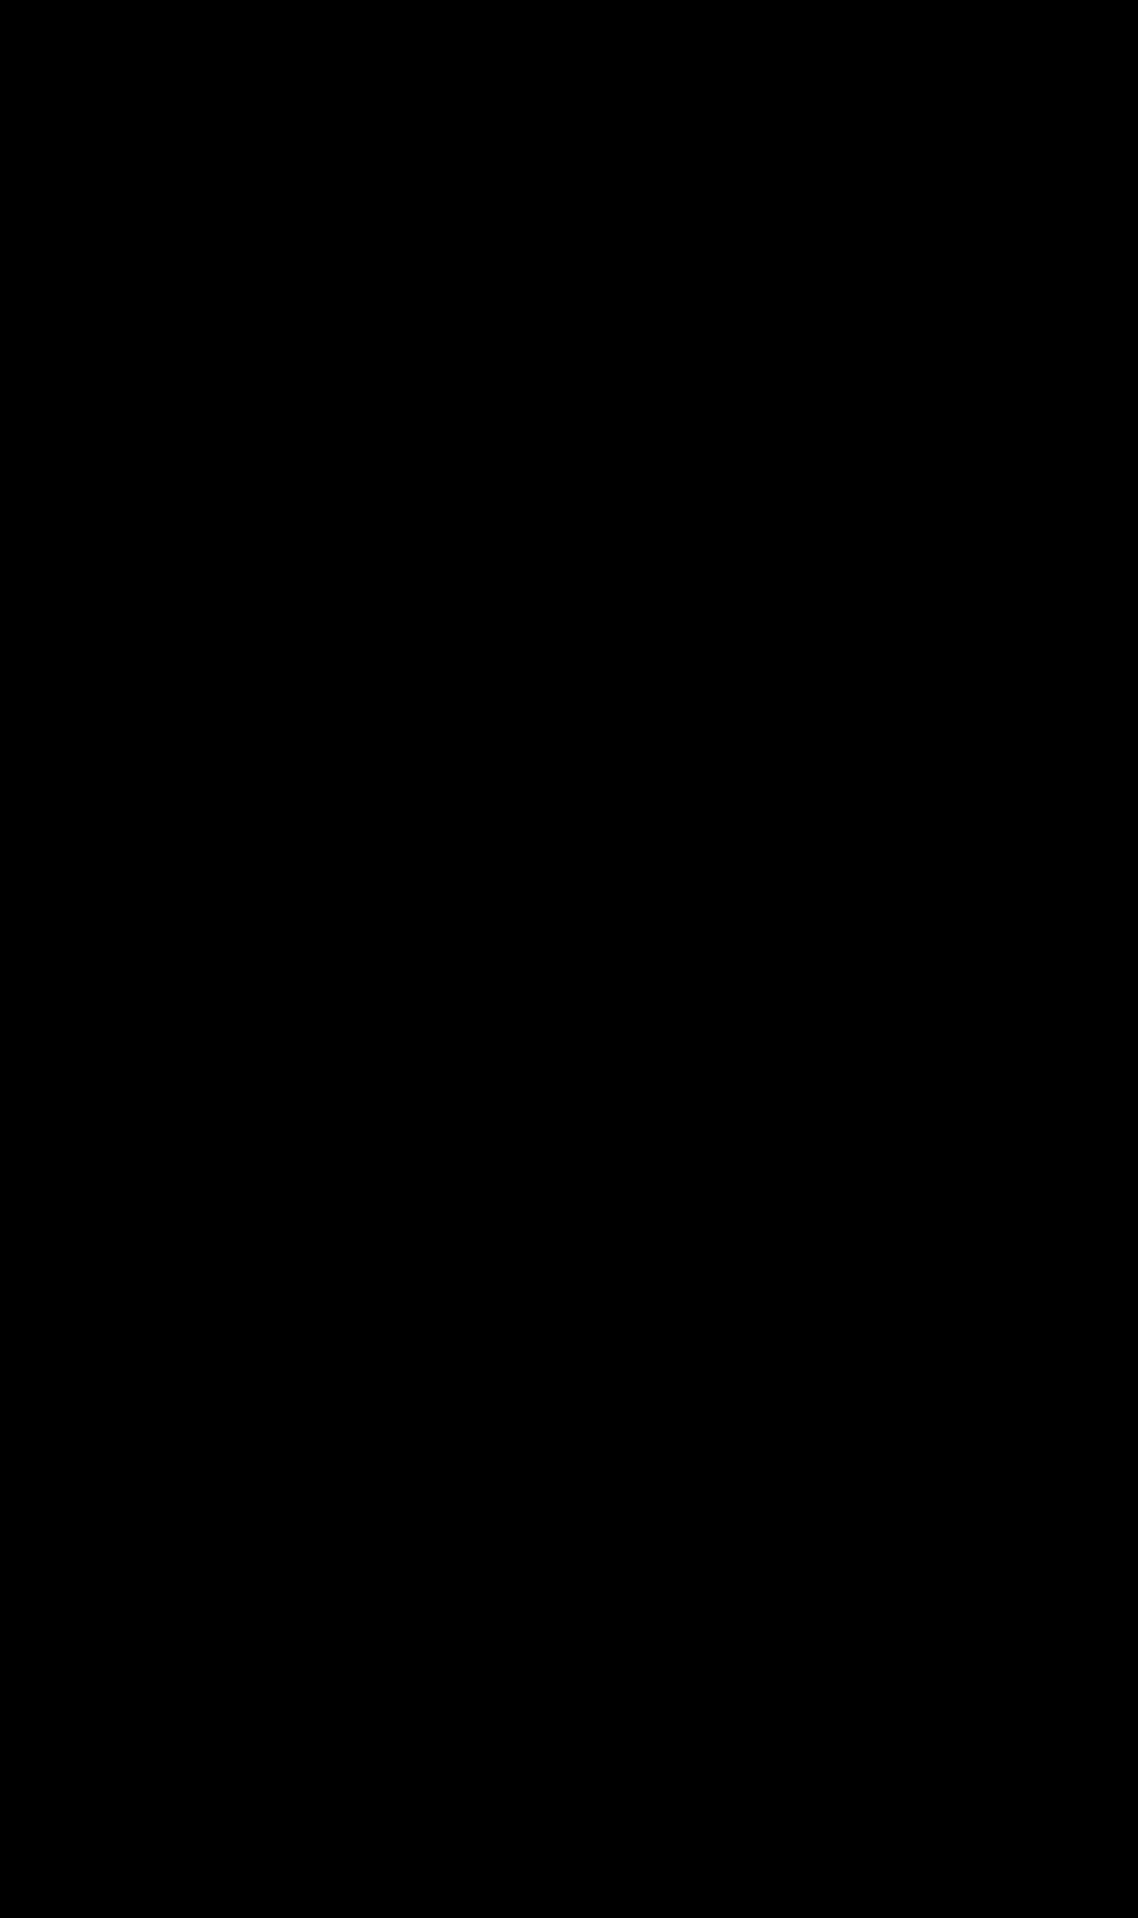 1nehohbprfdainik-jagran-12-4-2018-1